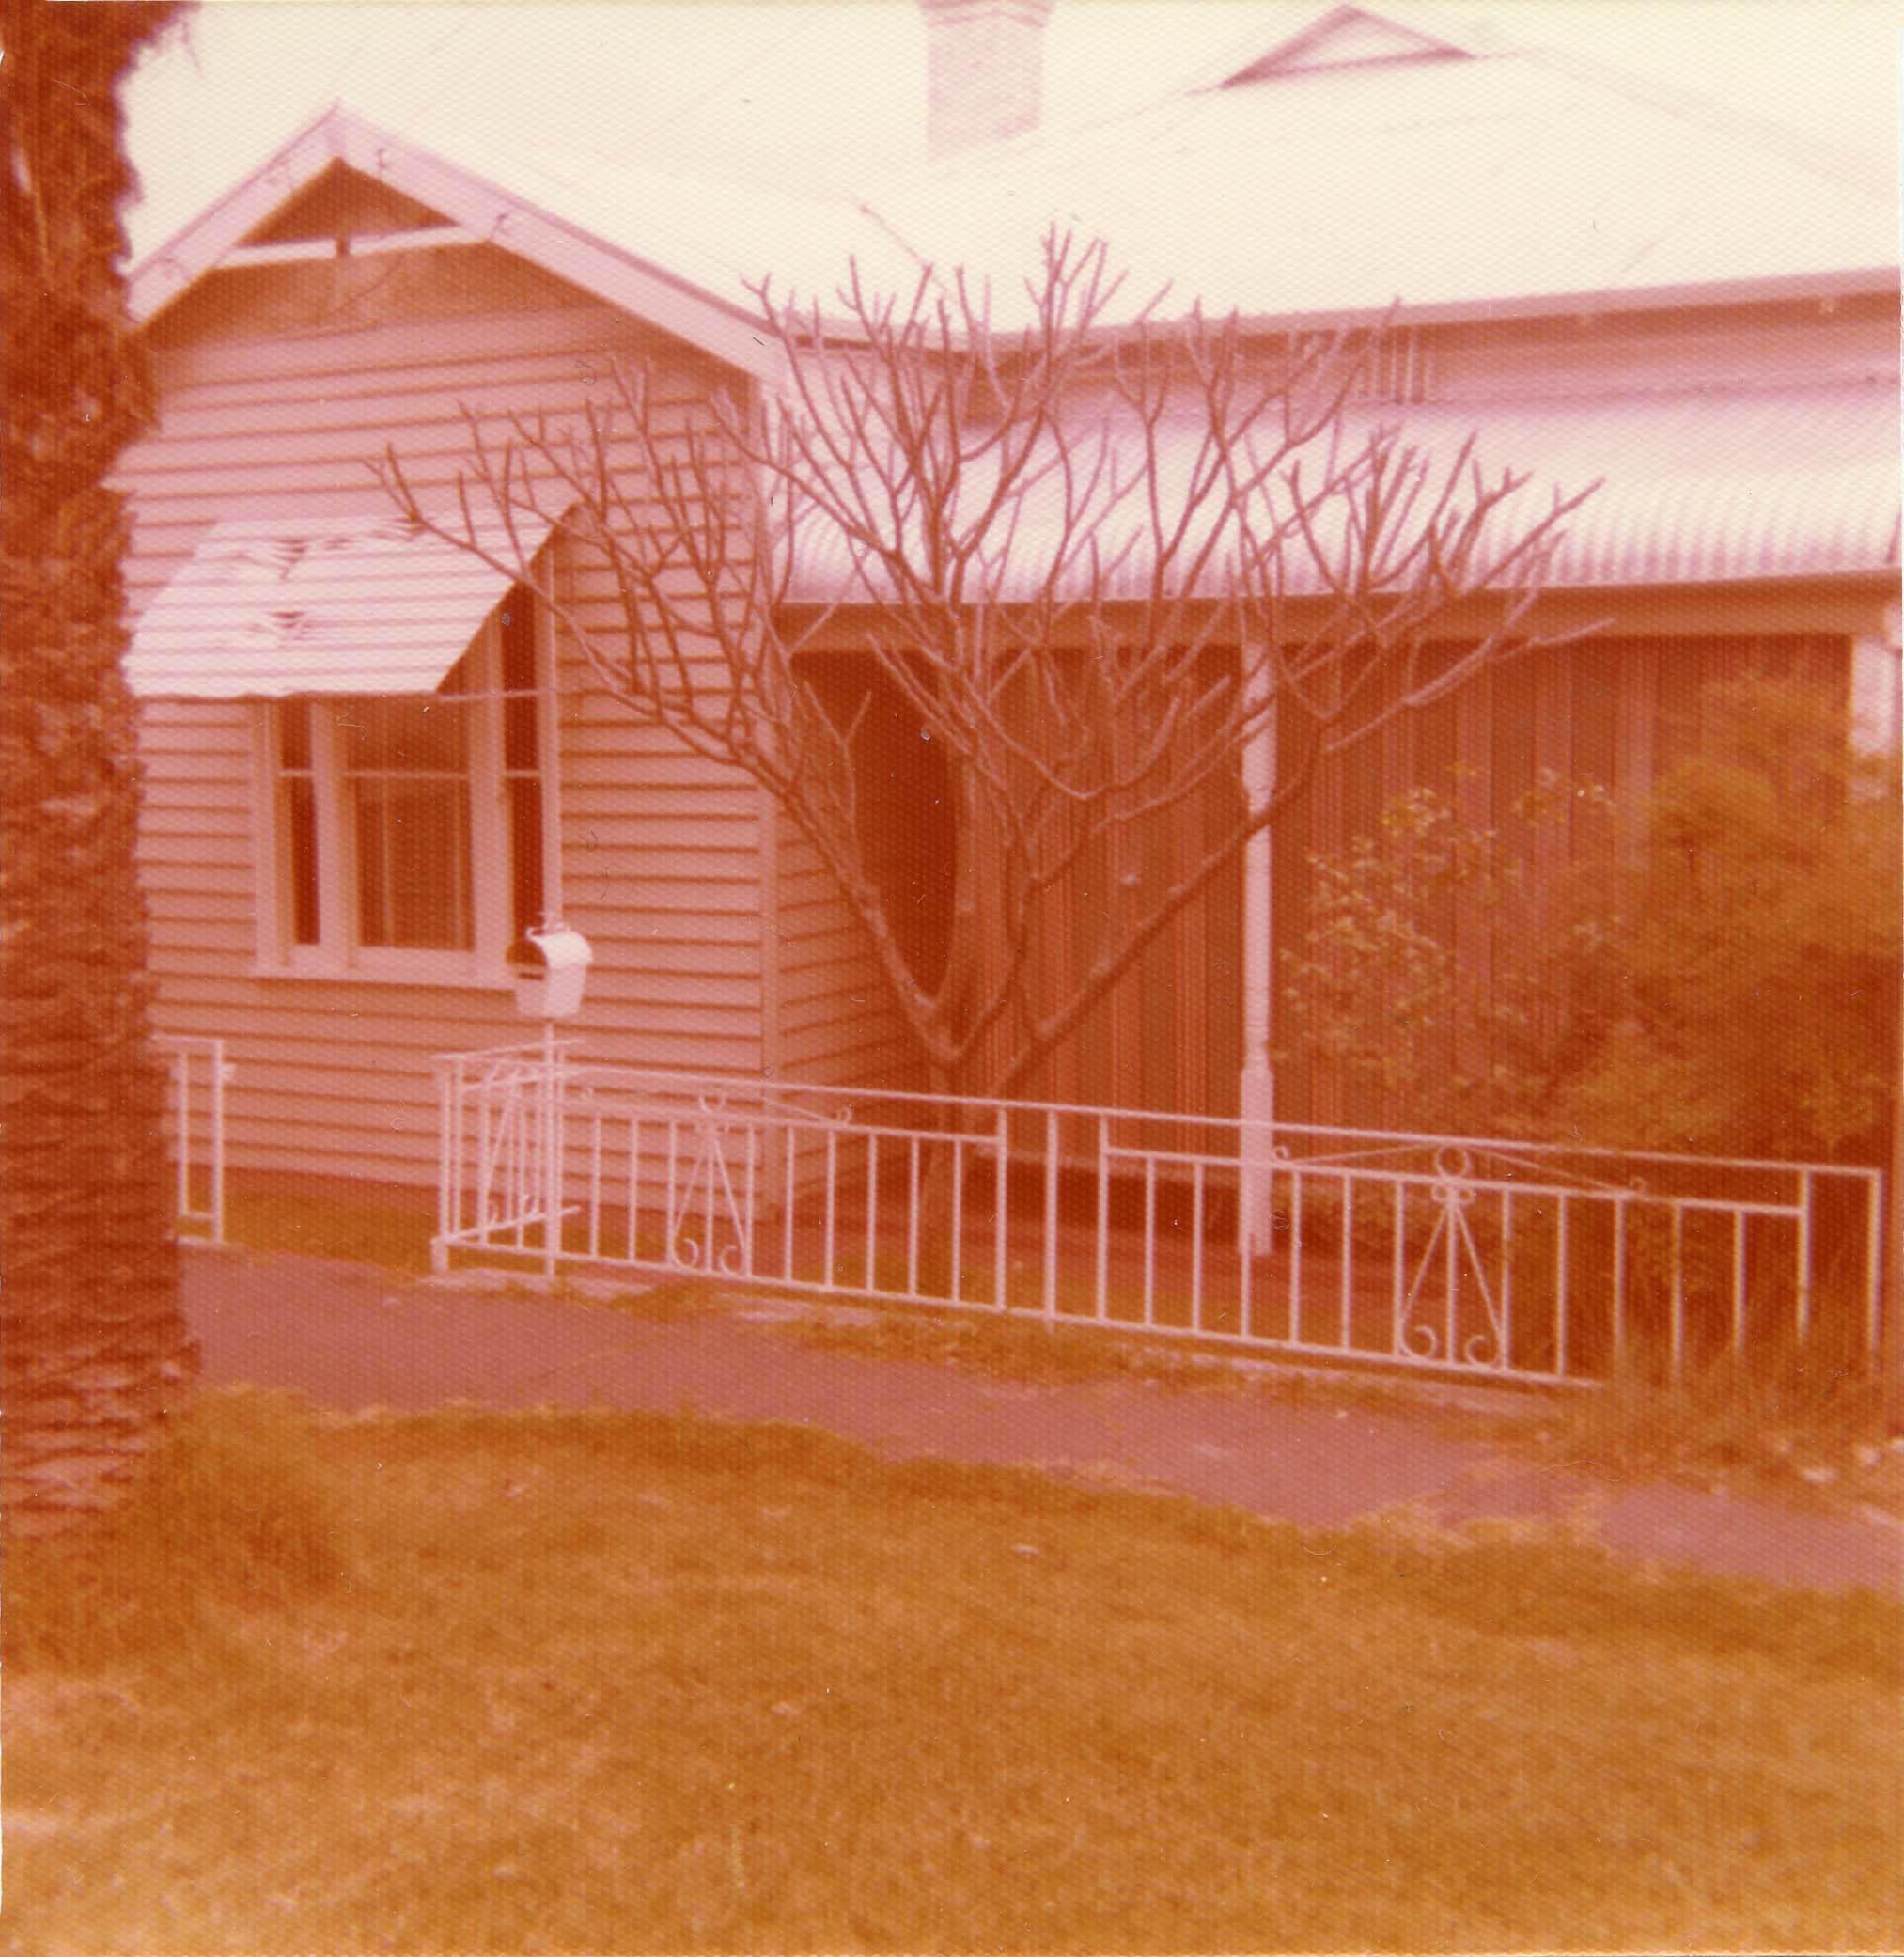 30. 7 Peach Street, 1970s